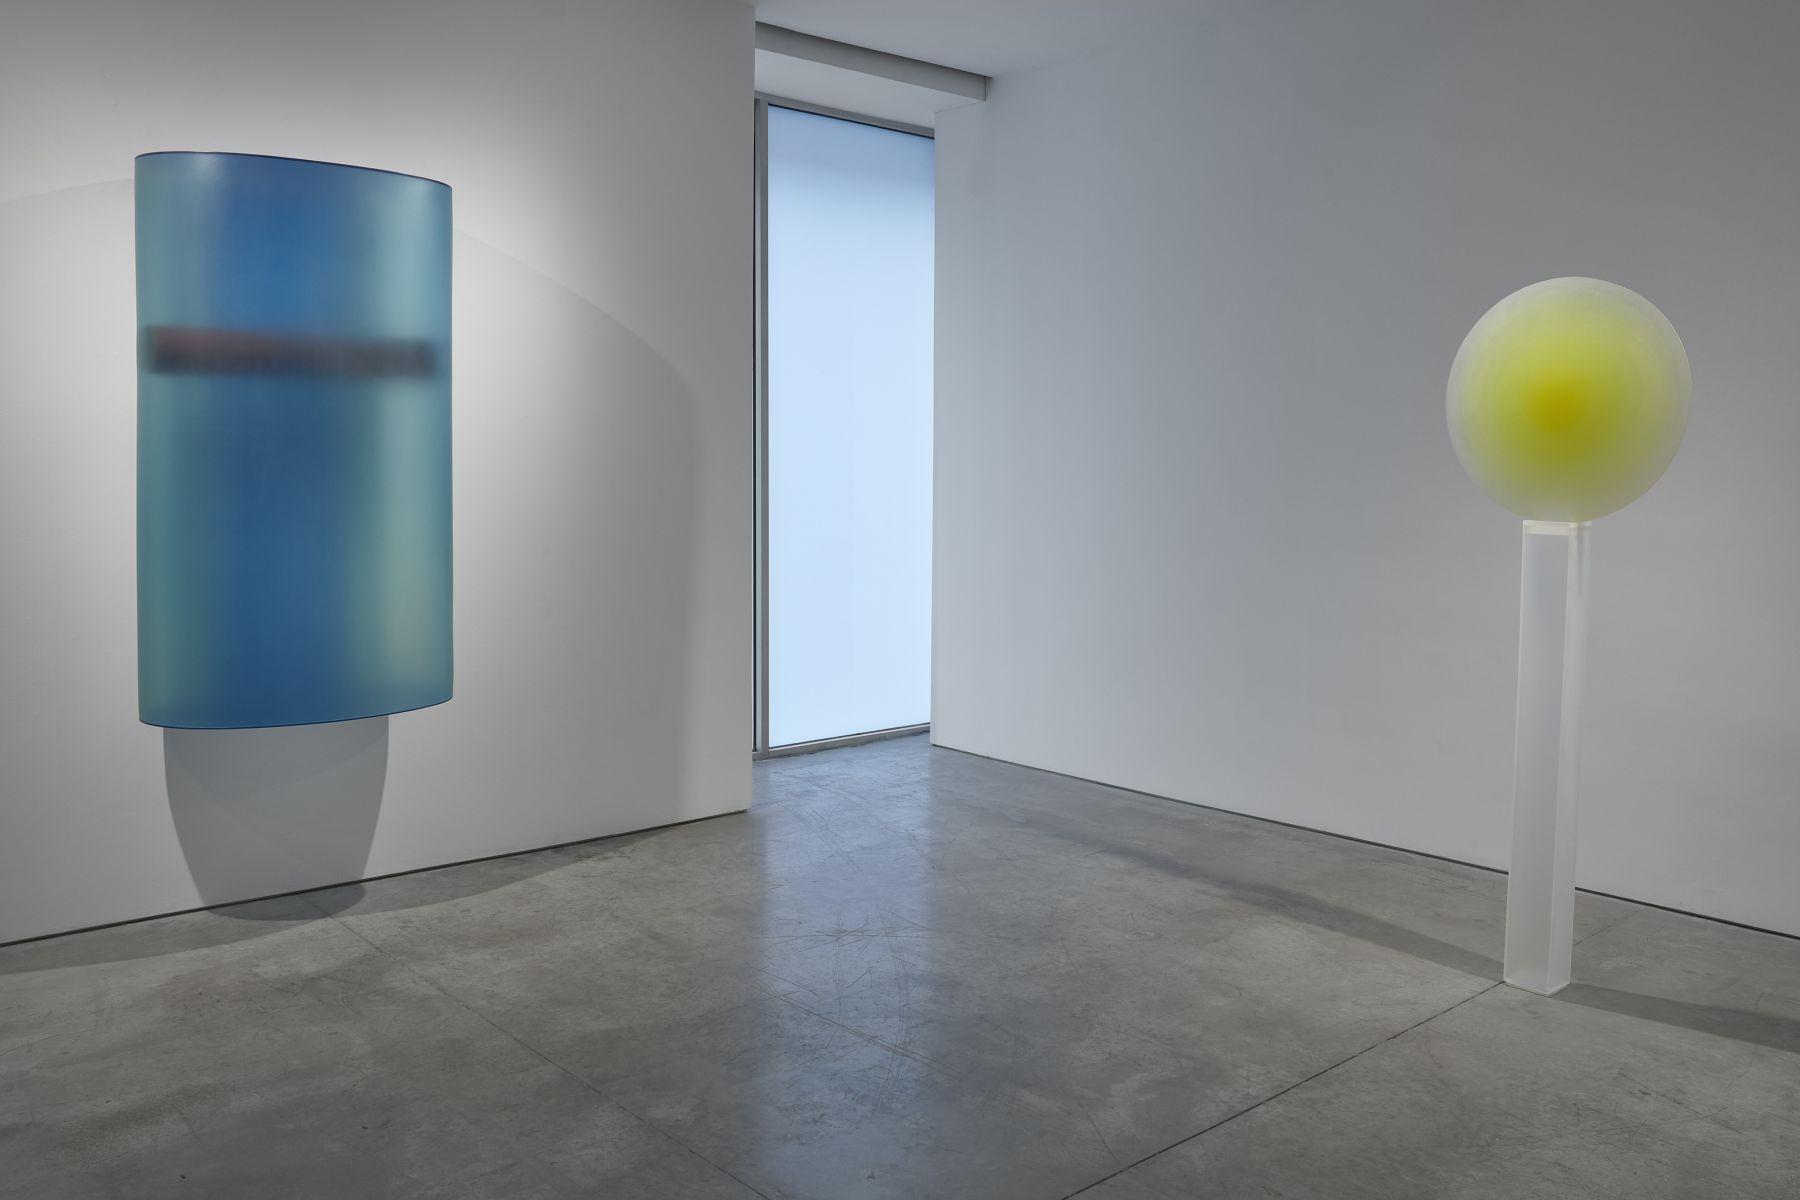 Installation view, Lehmann Maupin, New York, 2019, Photo by Matthew Herrmann